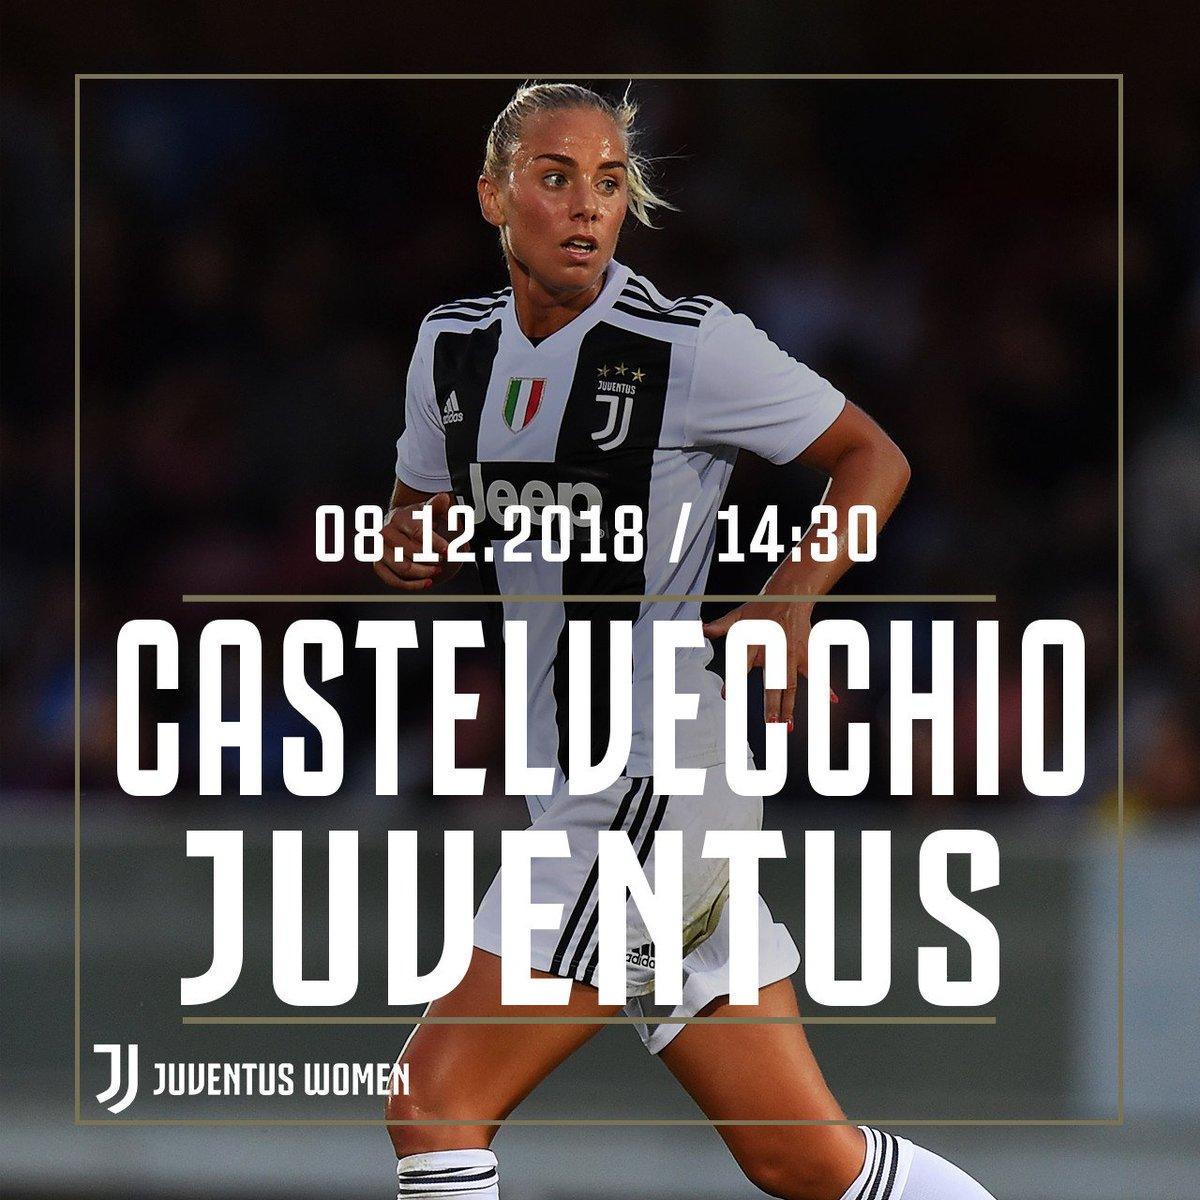 🙌 #JUVENTUSWOMEN MATCHDAY! 🙌 🇮🇹🏆 Coppa Italia 🆚 Castelvecchio 🏟 Stadio Comunale Capanni ⏰ 14:30 CET 📲 #CastelvecchioJuve ⚪️ #FinoAllaFine #ForzaJuve ⚫️